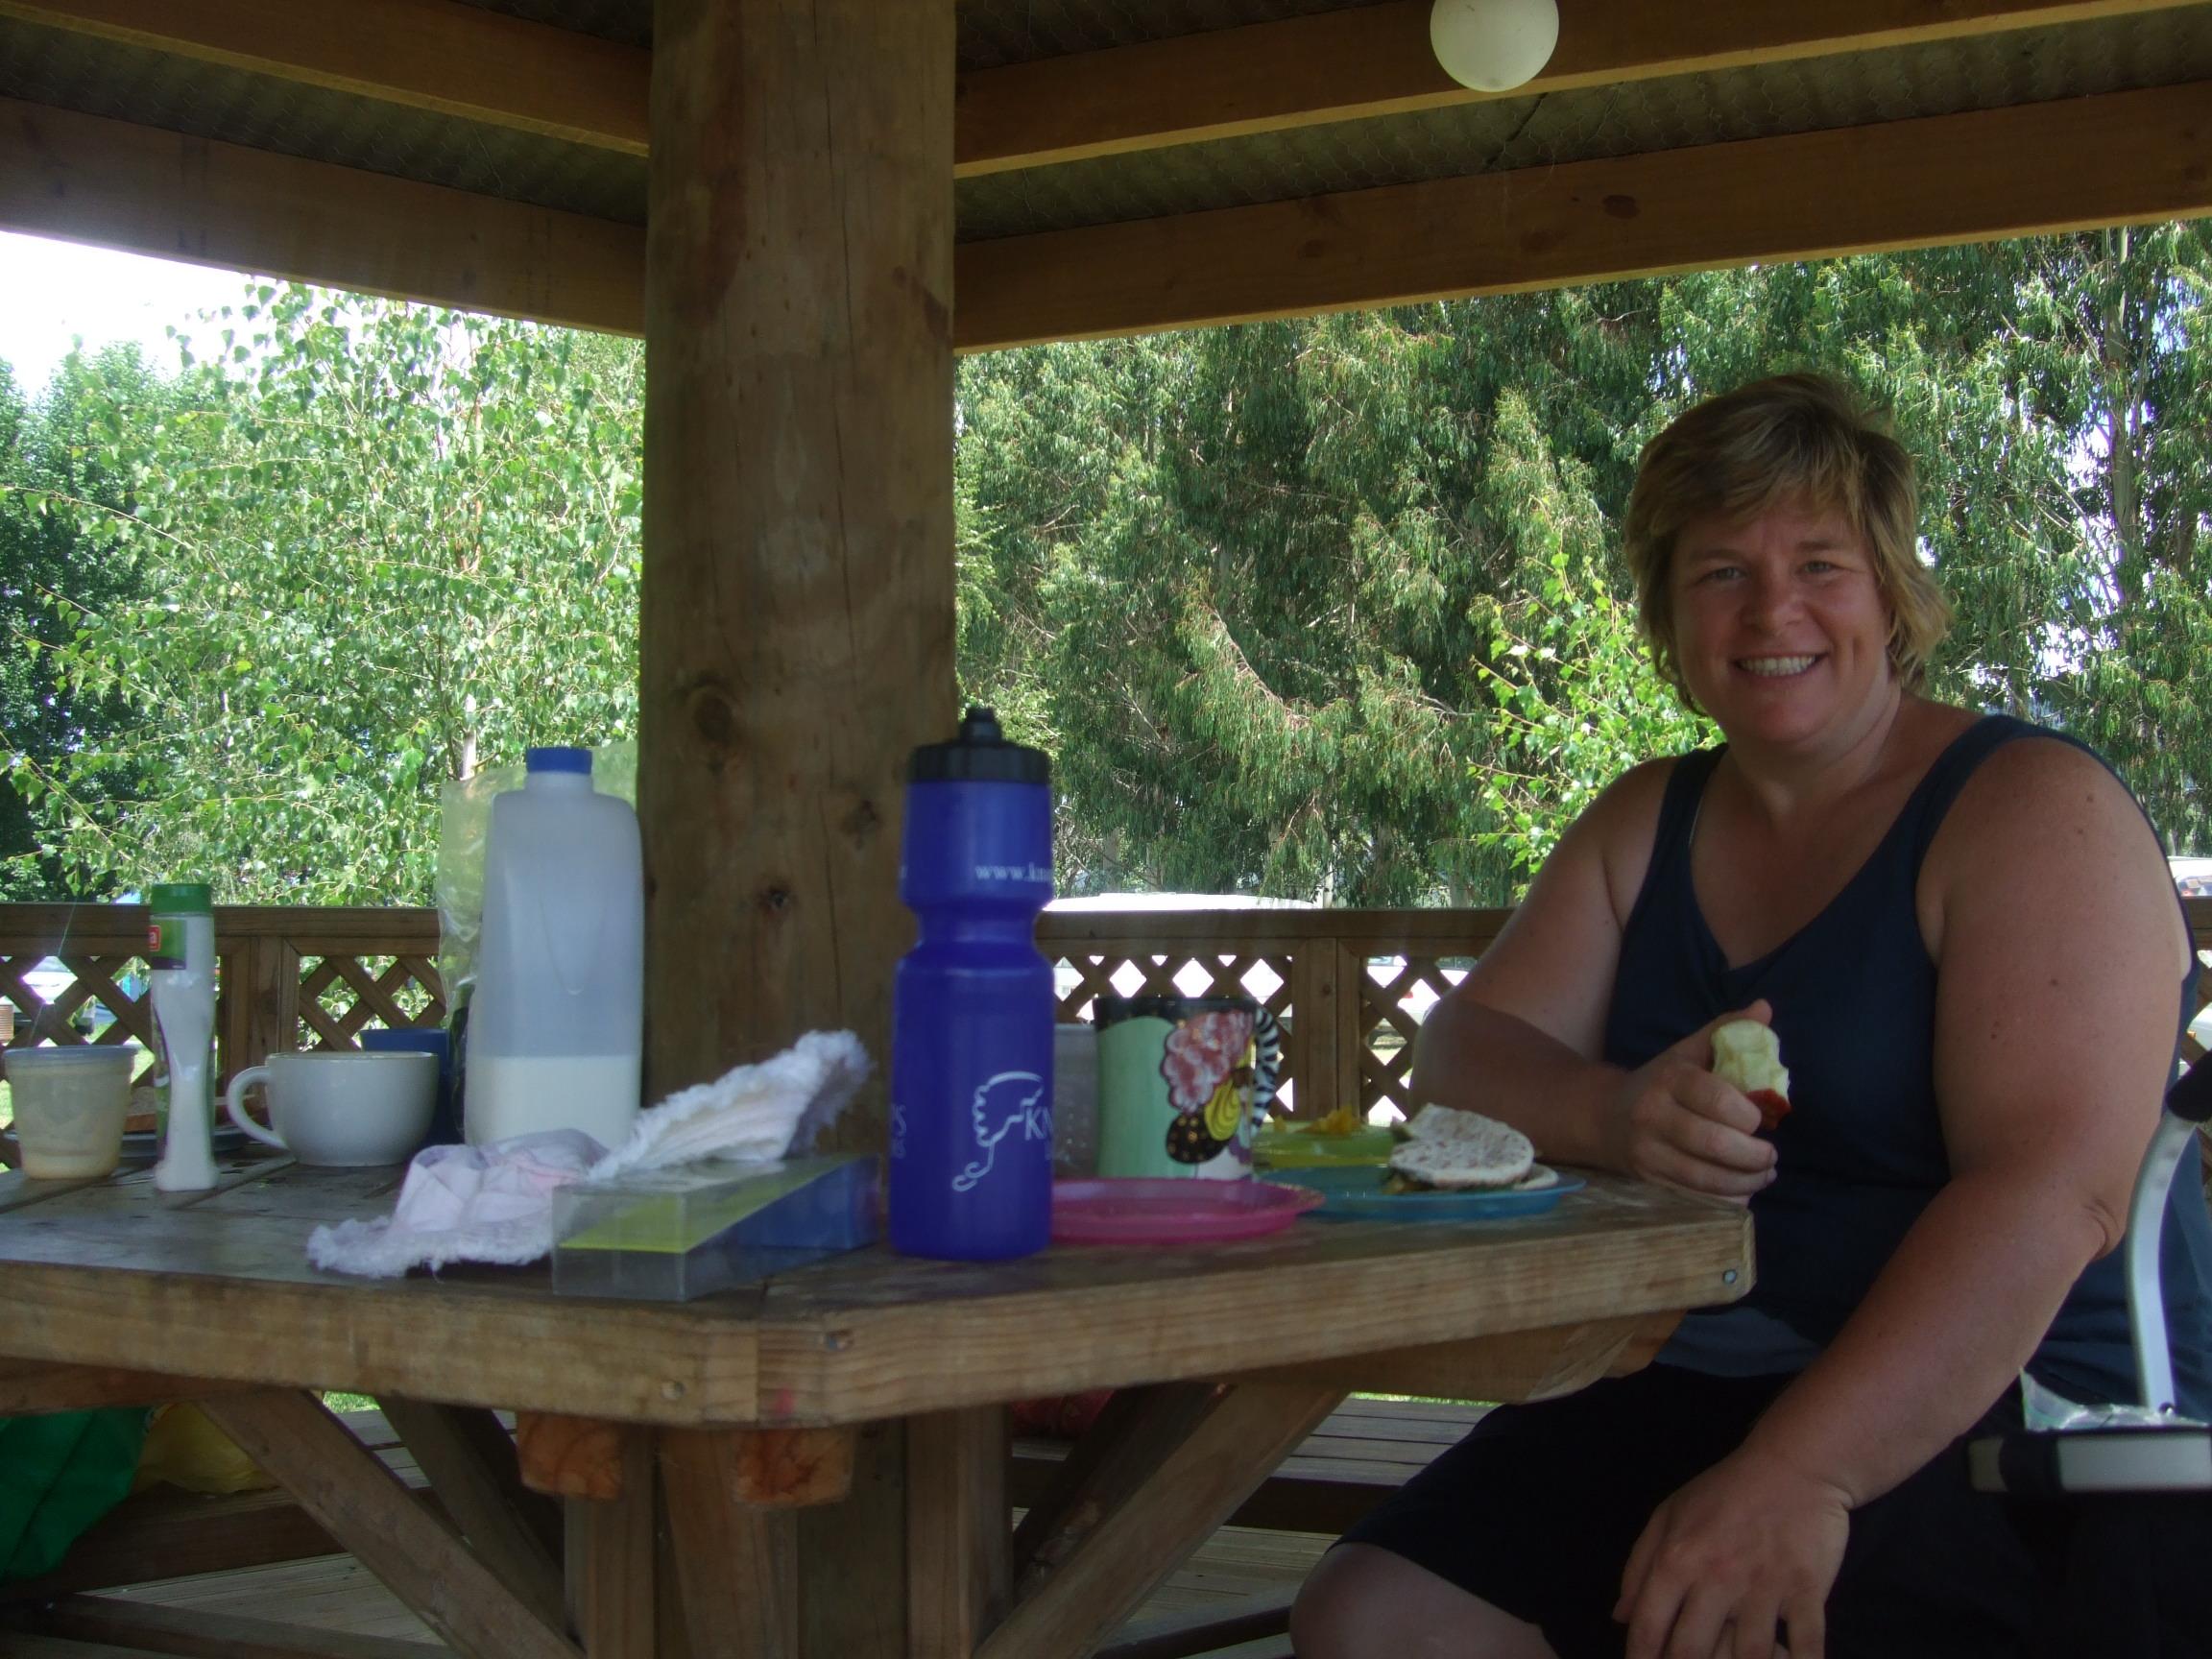 Adrienne eating lunch in the gazebo